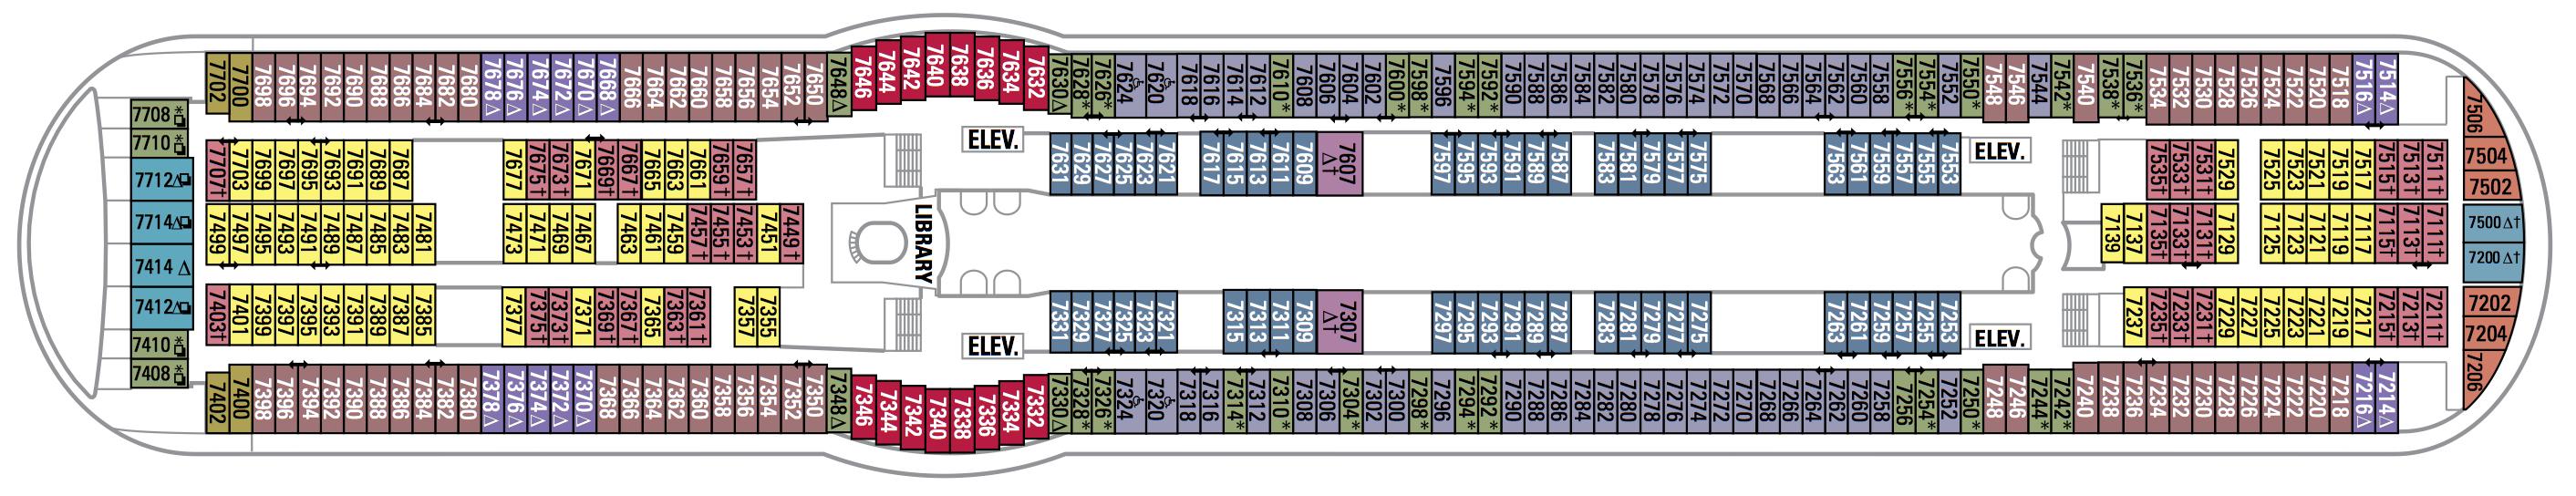 Royal Caribbean- Freedom of the Seas Deck  7.jpeg